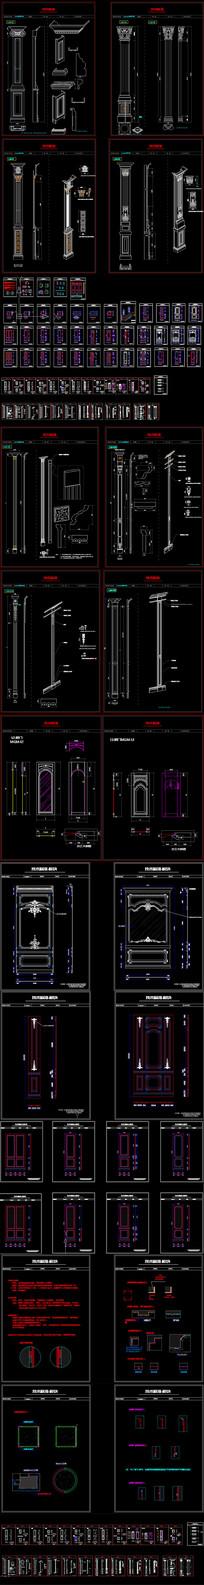 欧式护墙板CAD标准图库